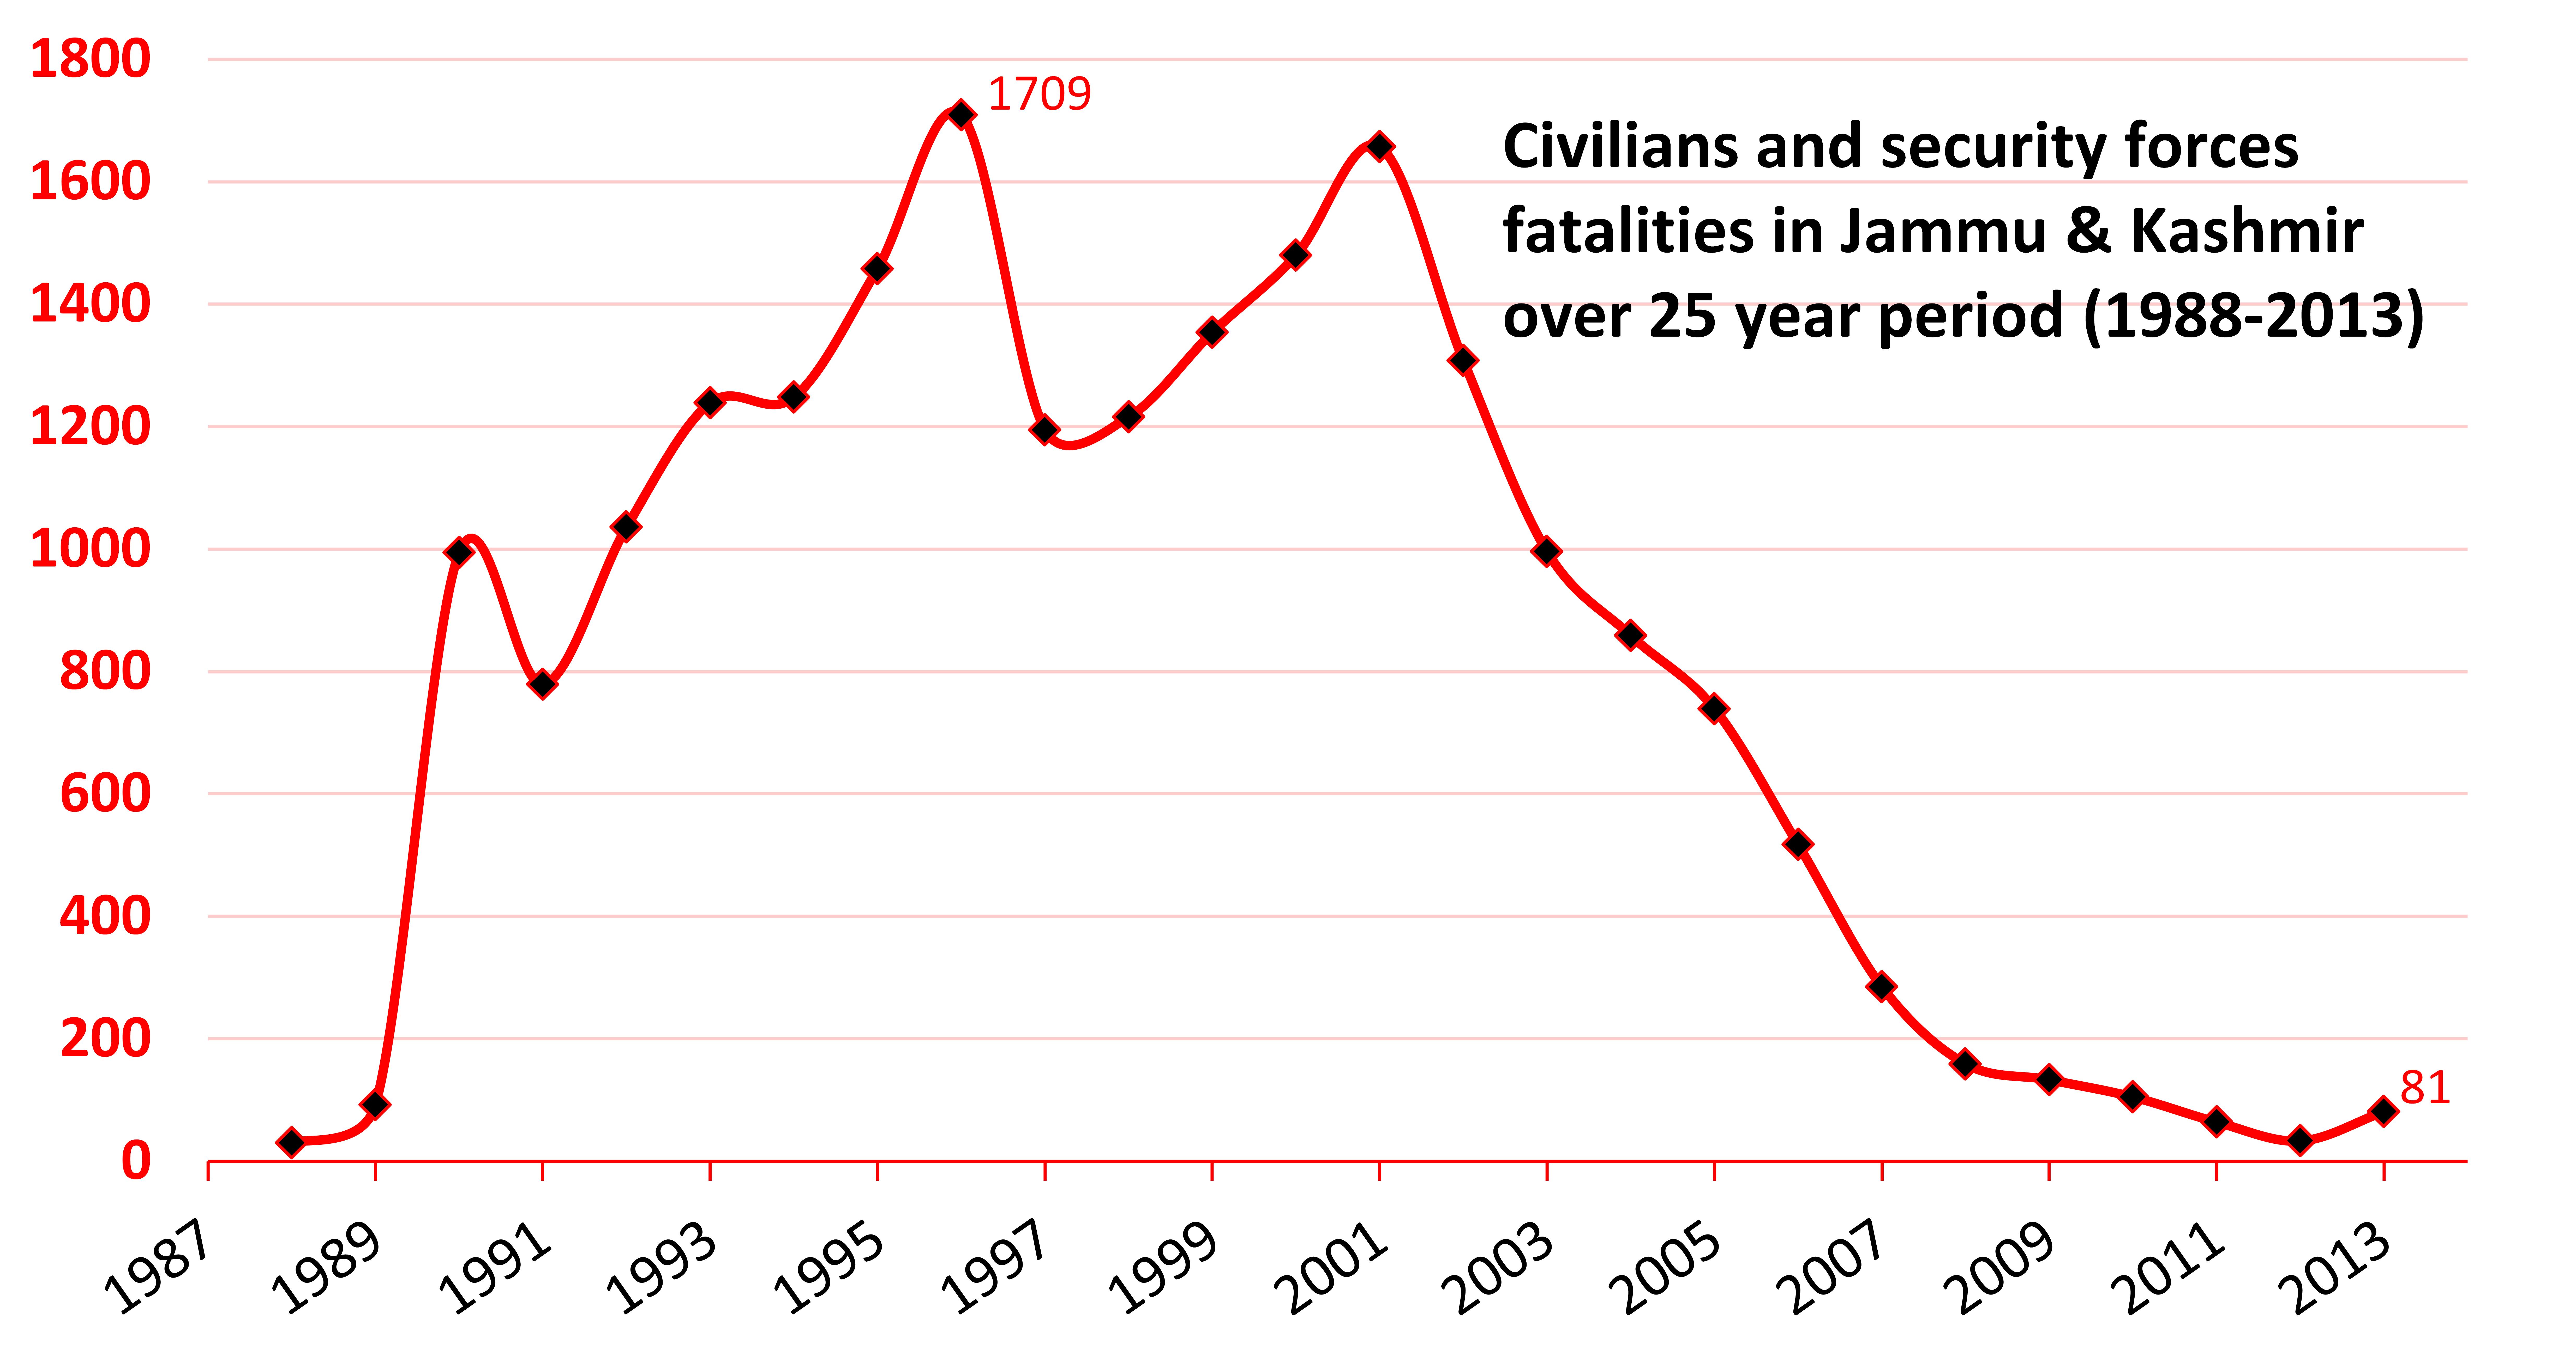 impact of terrorism on jammu and kashmir tourism Impact of terrorism on jammu and kashmir tourism responsibility: r  soundararajan, p rajan imprint: delhi, india : kalpaz publicaitons, 2006  physical.